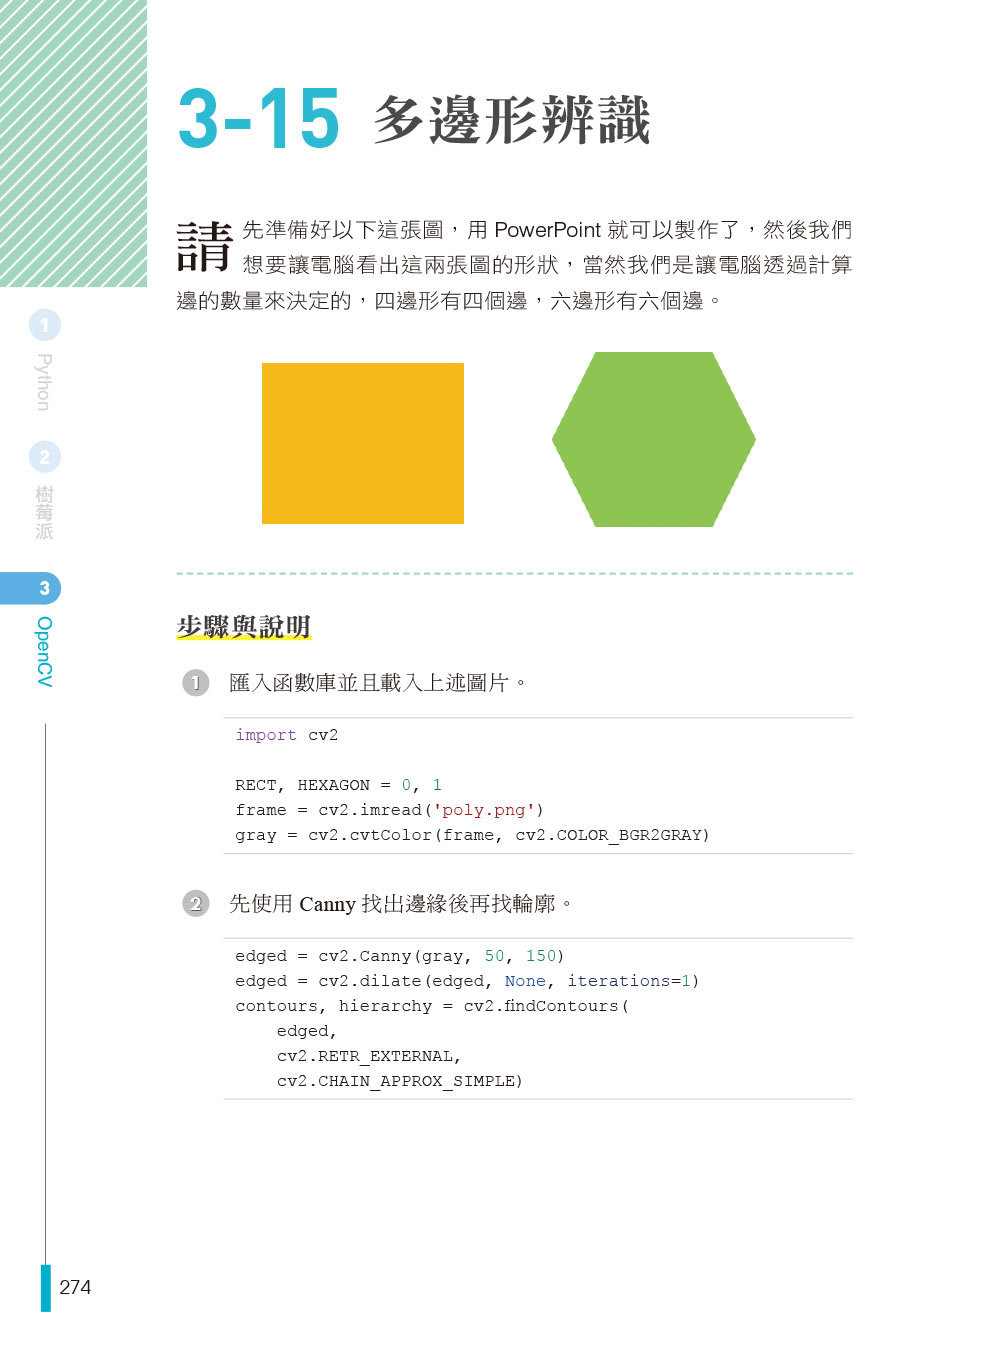 AIOT 與 OpenCV 實戰應用:Python、樹莓派、物聯網與機器視覺, 2/e-preview-7